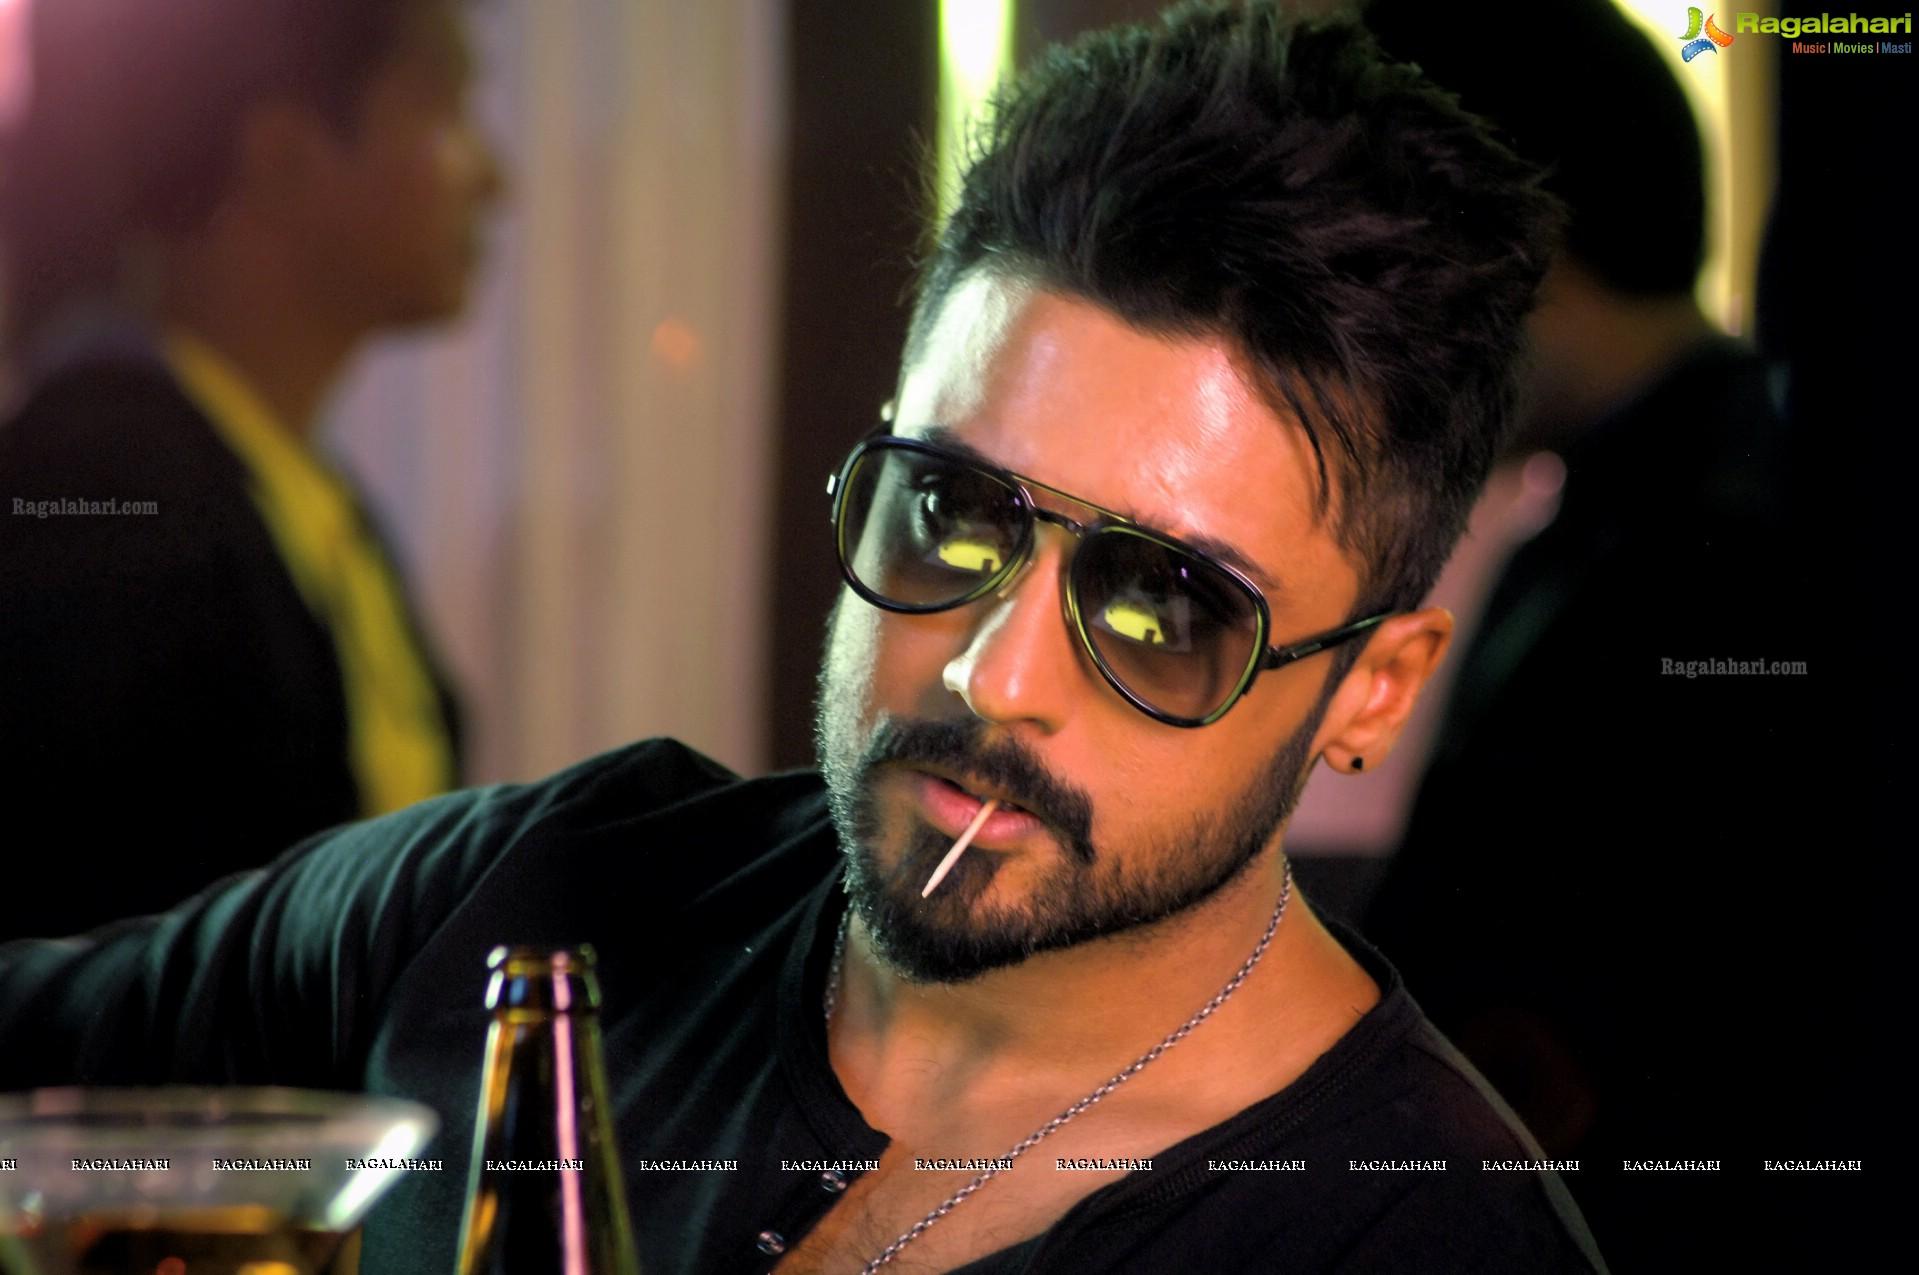 sikander movie gallery (anjaan in tamil) - surya, samantha